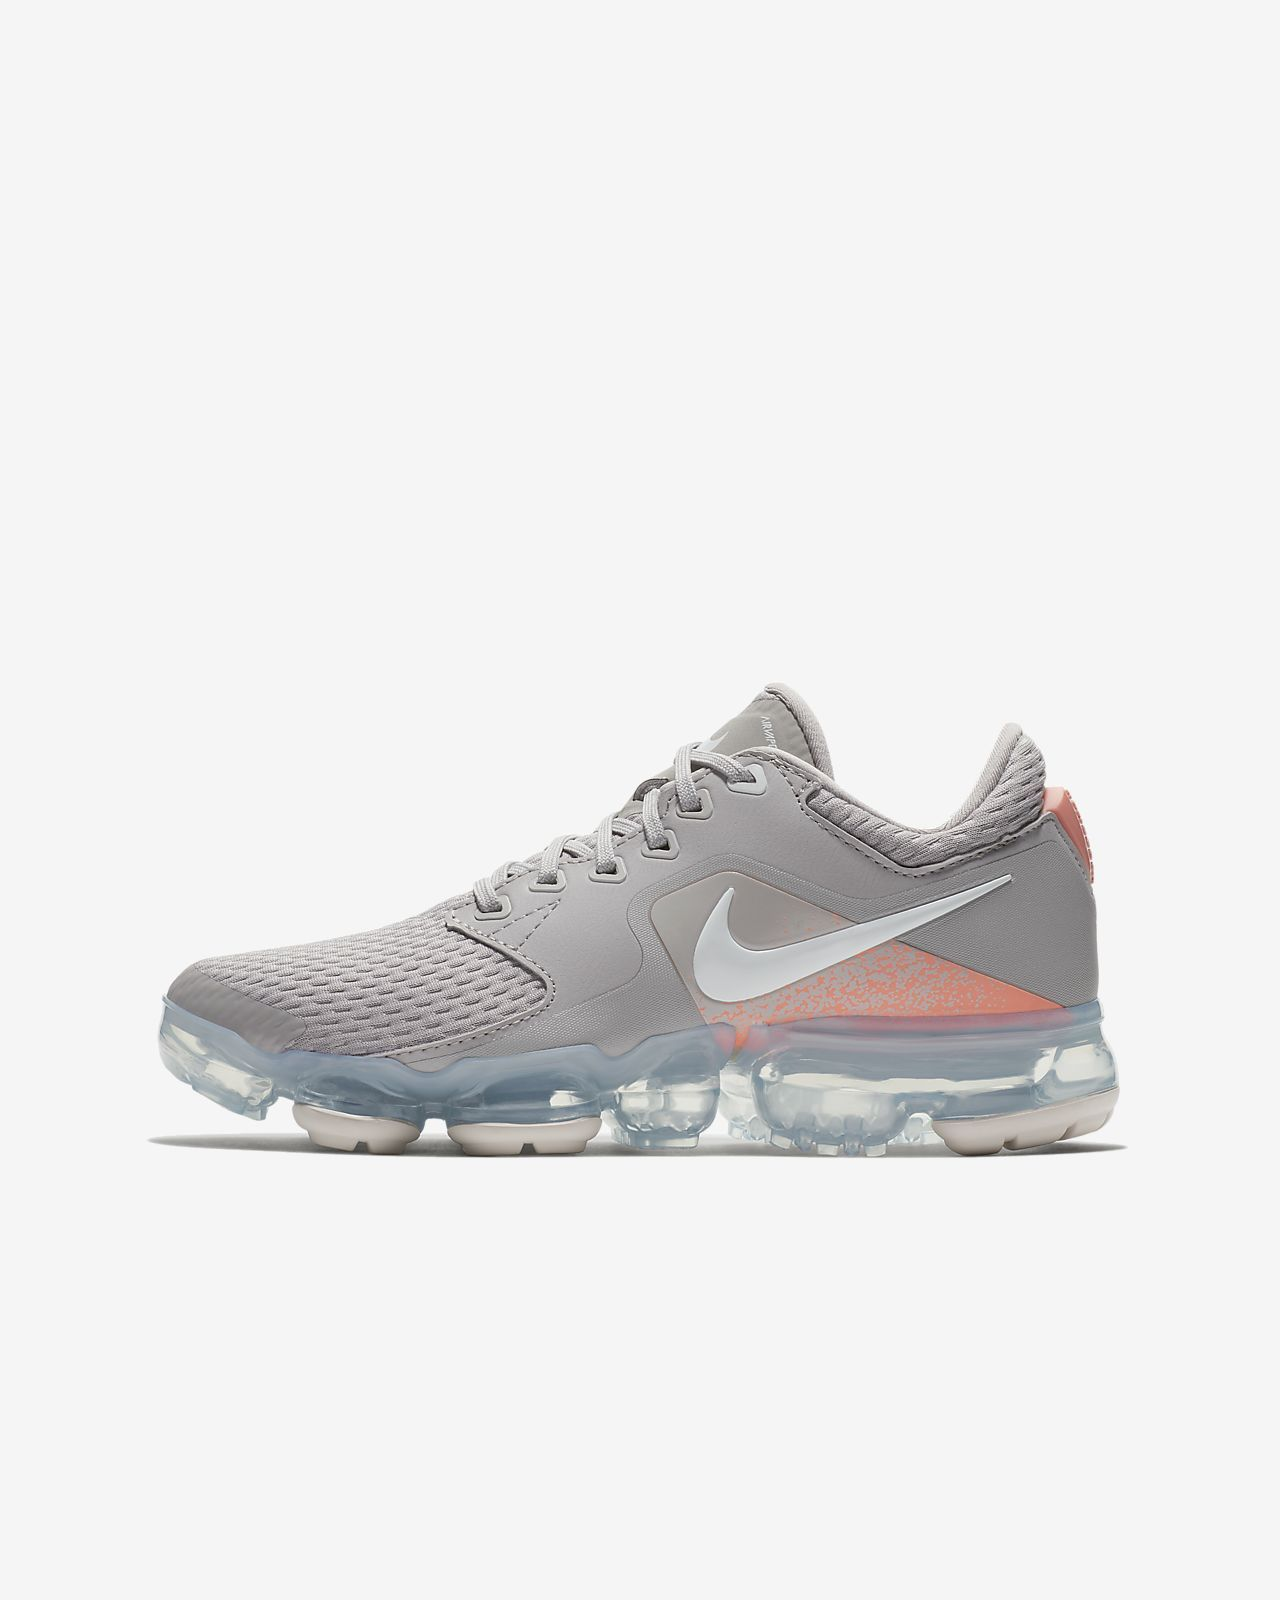 1889f7b33a9 Big Kids Nike Air VaporMax Running Shoe Atmosphere Grey Vast Grey Crimson  Pulse White - 917962-008